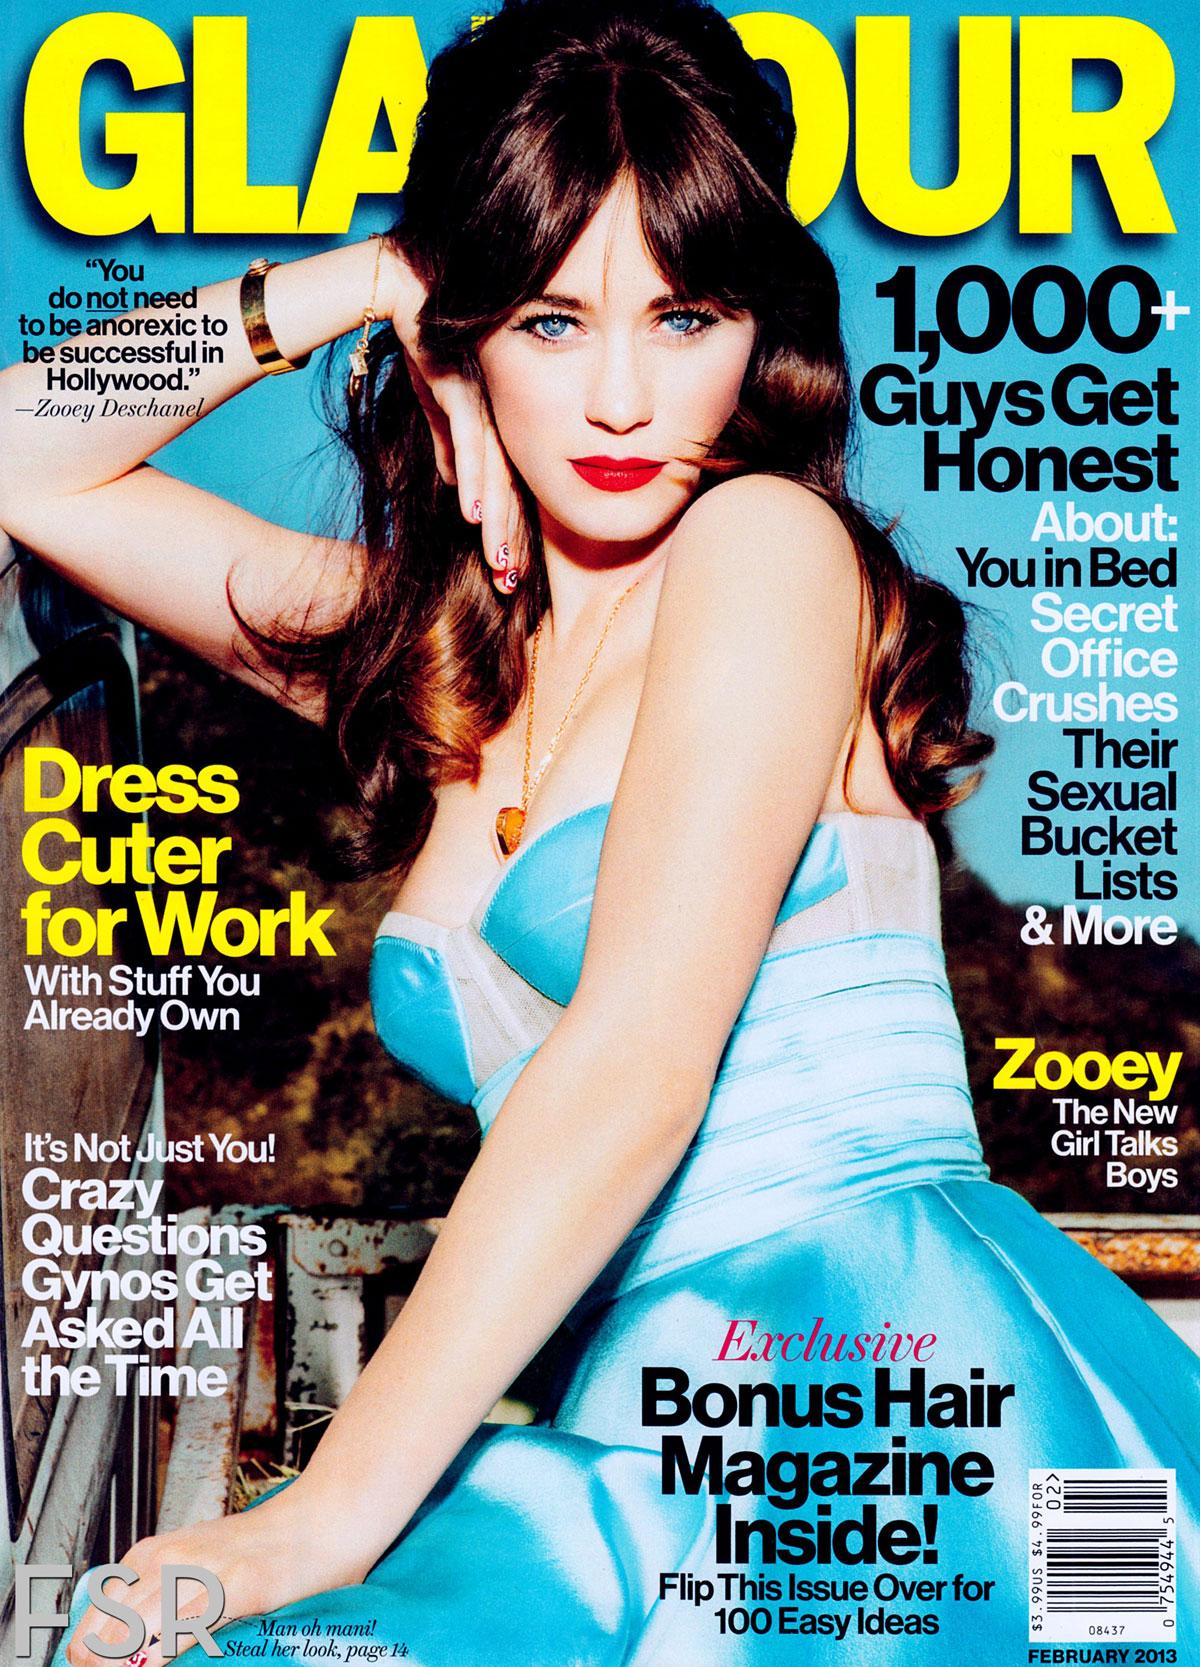 Zooey Deschanel In Glamour Magazine, February 2013